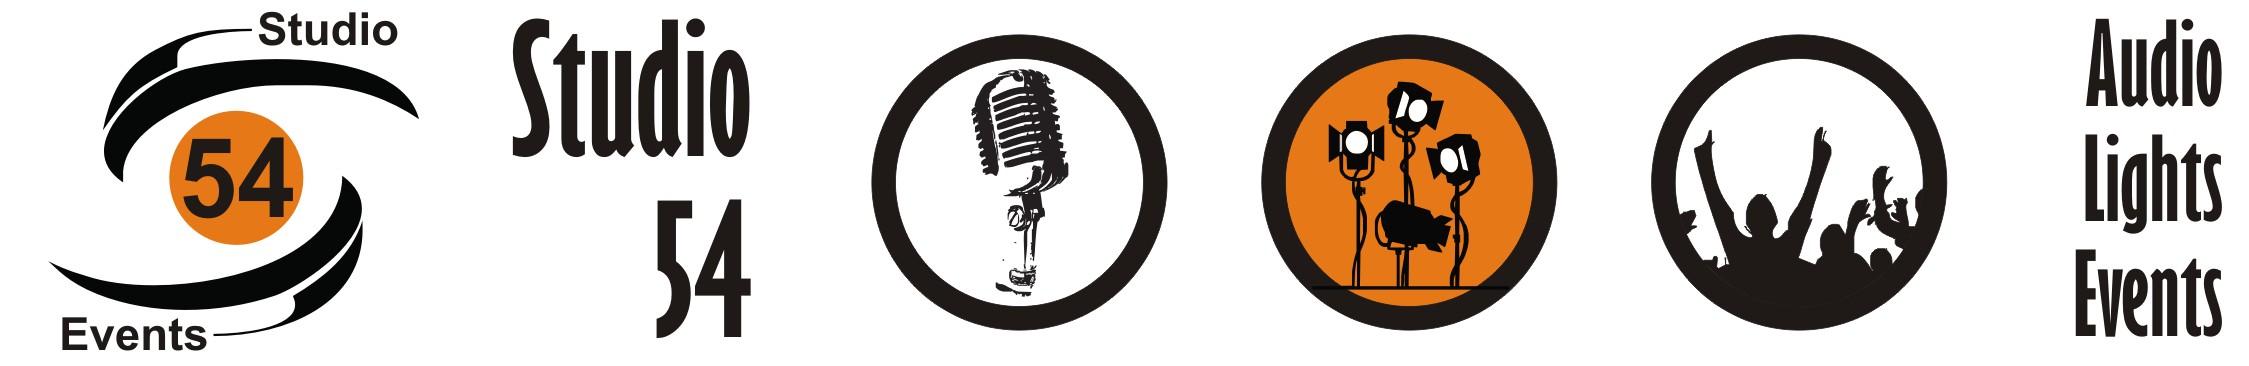 Studio 54 sound and lighiting